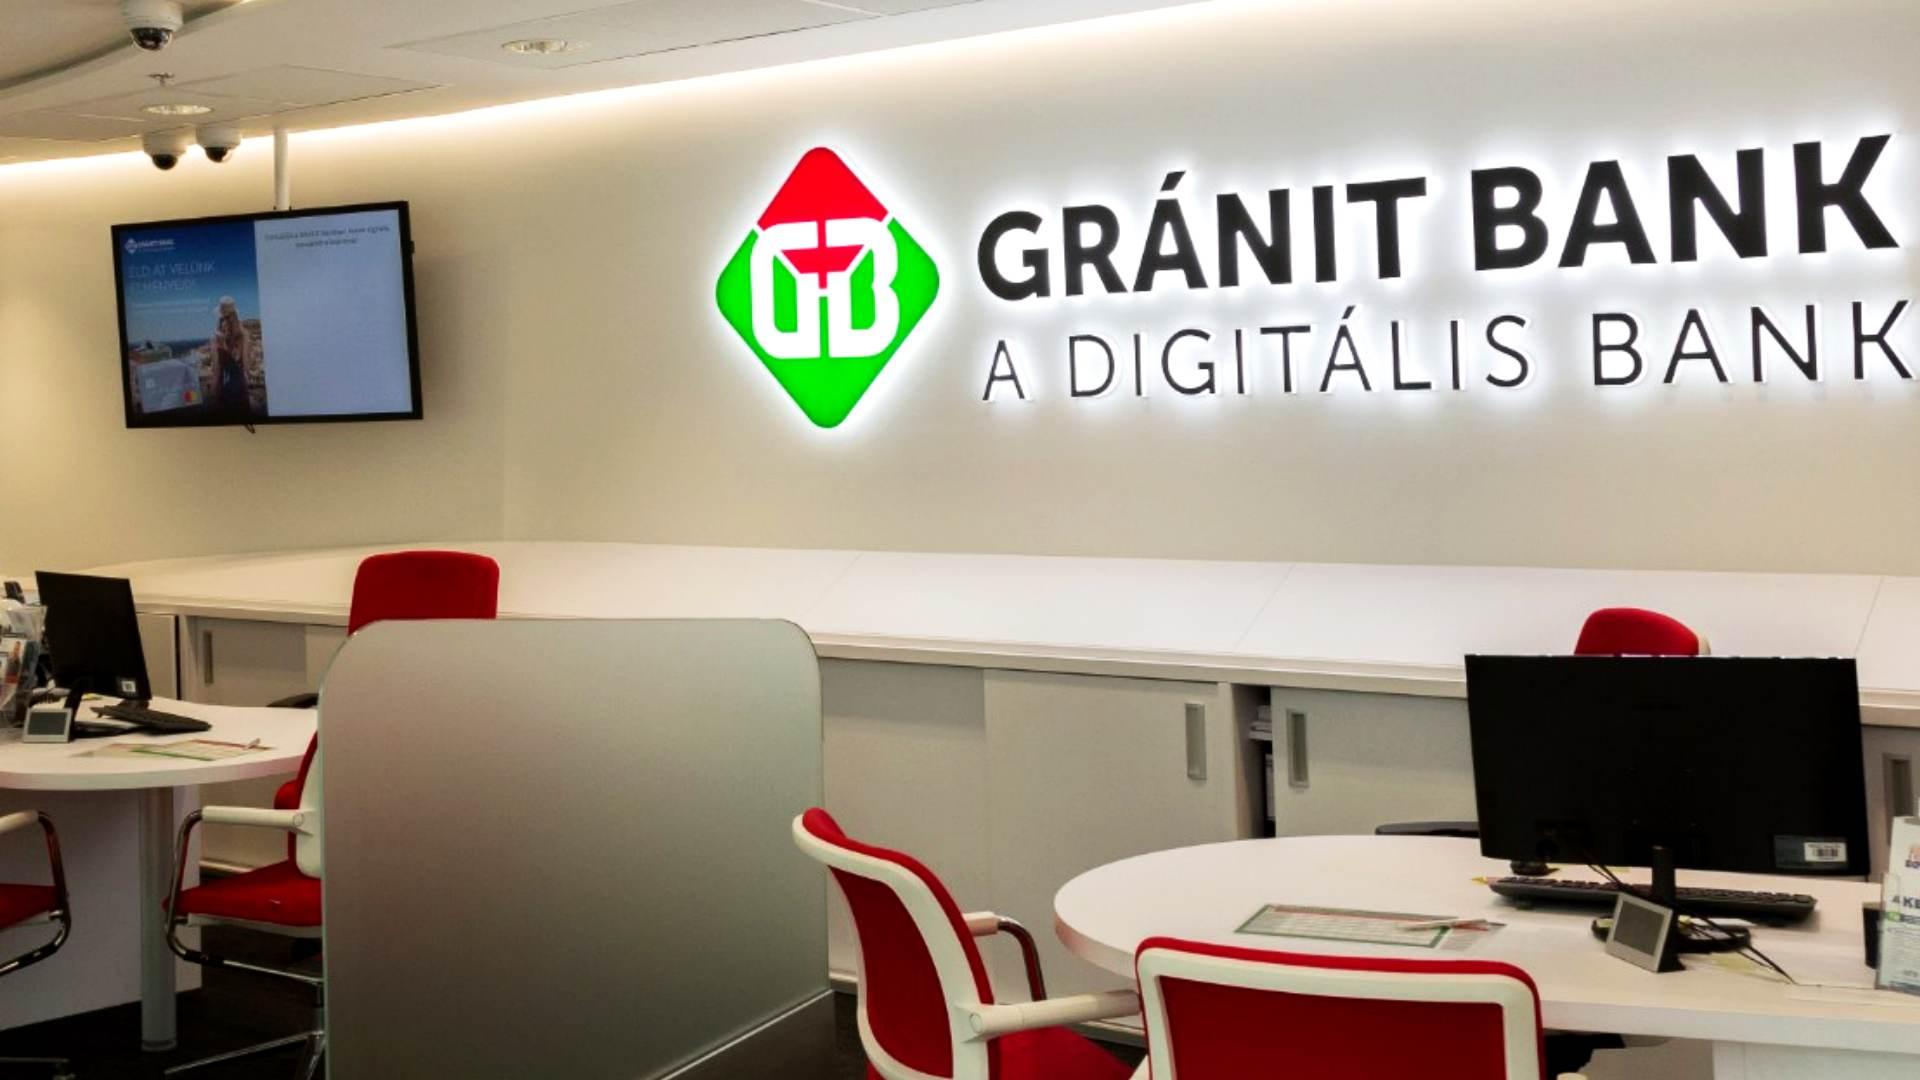 granit bank digitalis bank fintech verseny